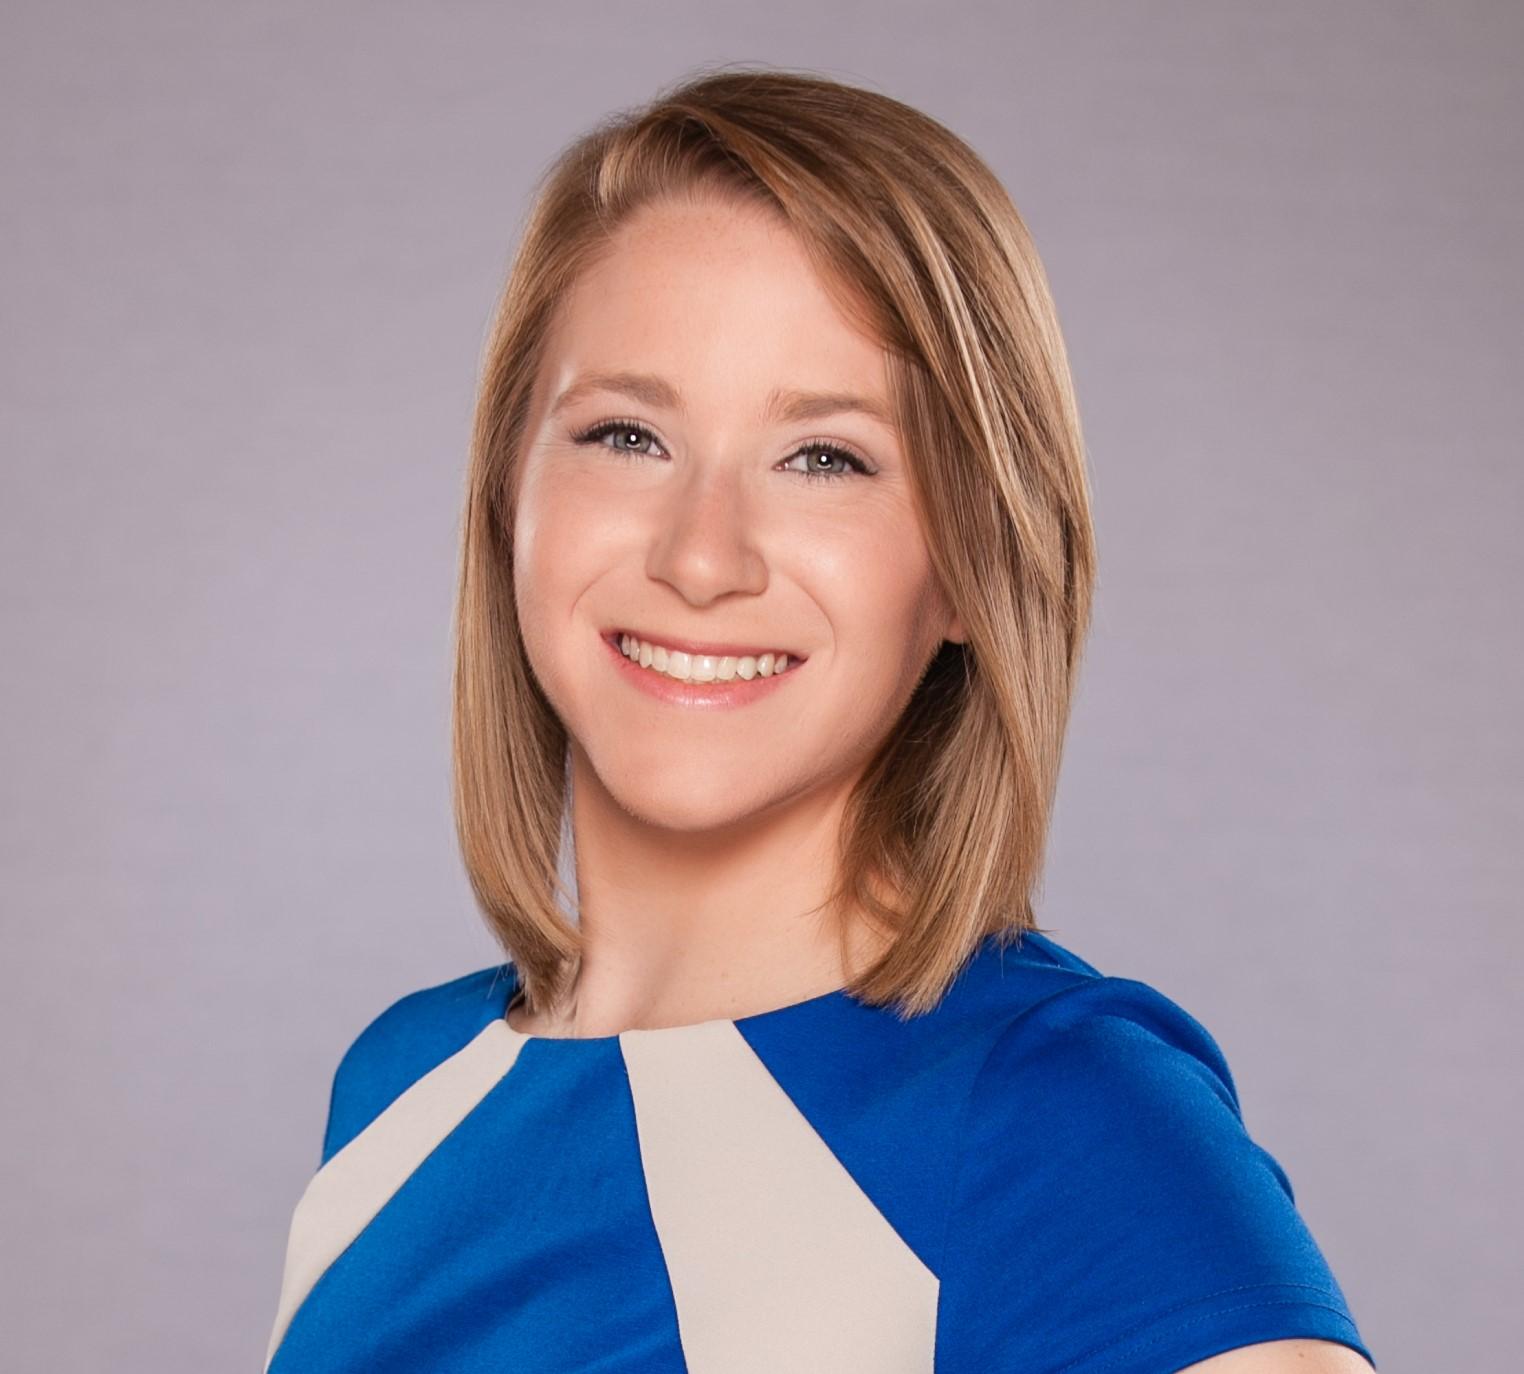 WISN 12 Welcomes Meteorologist Molly Bernard